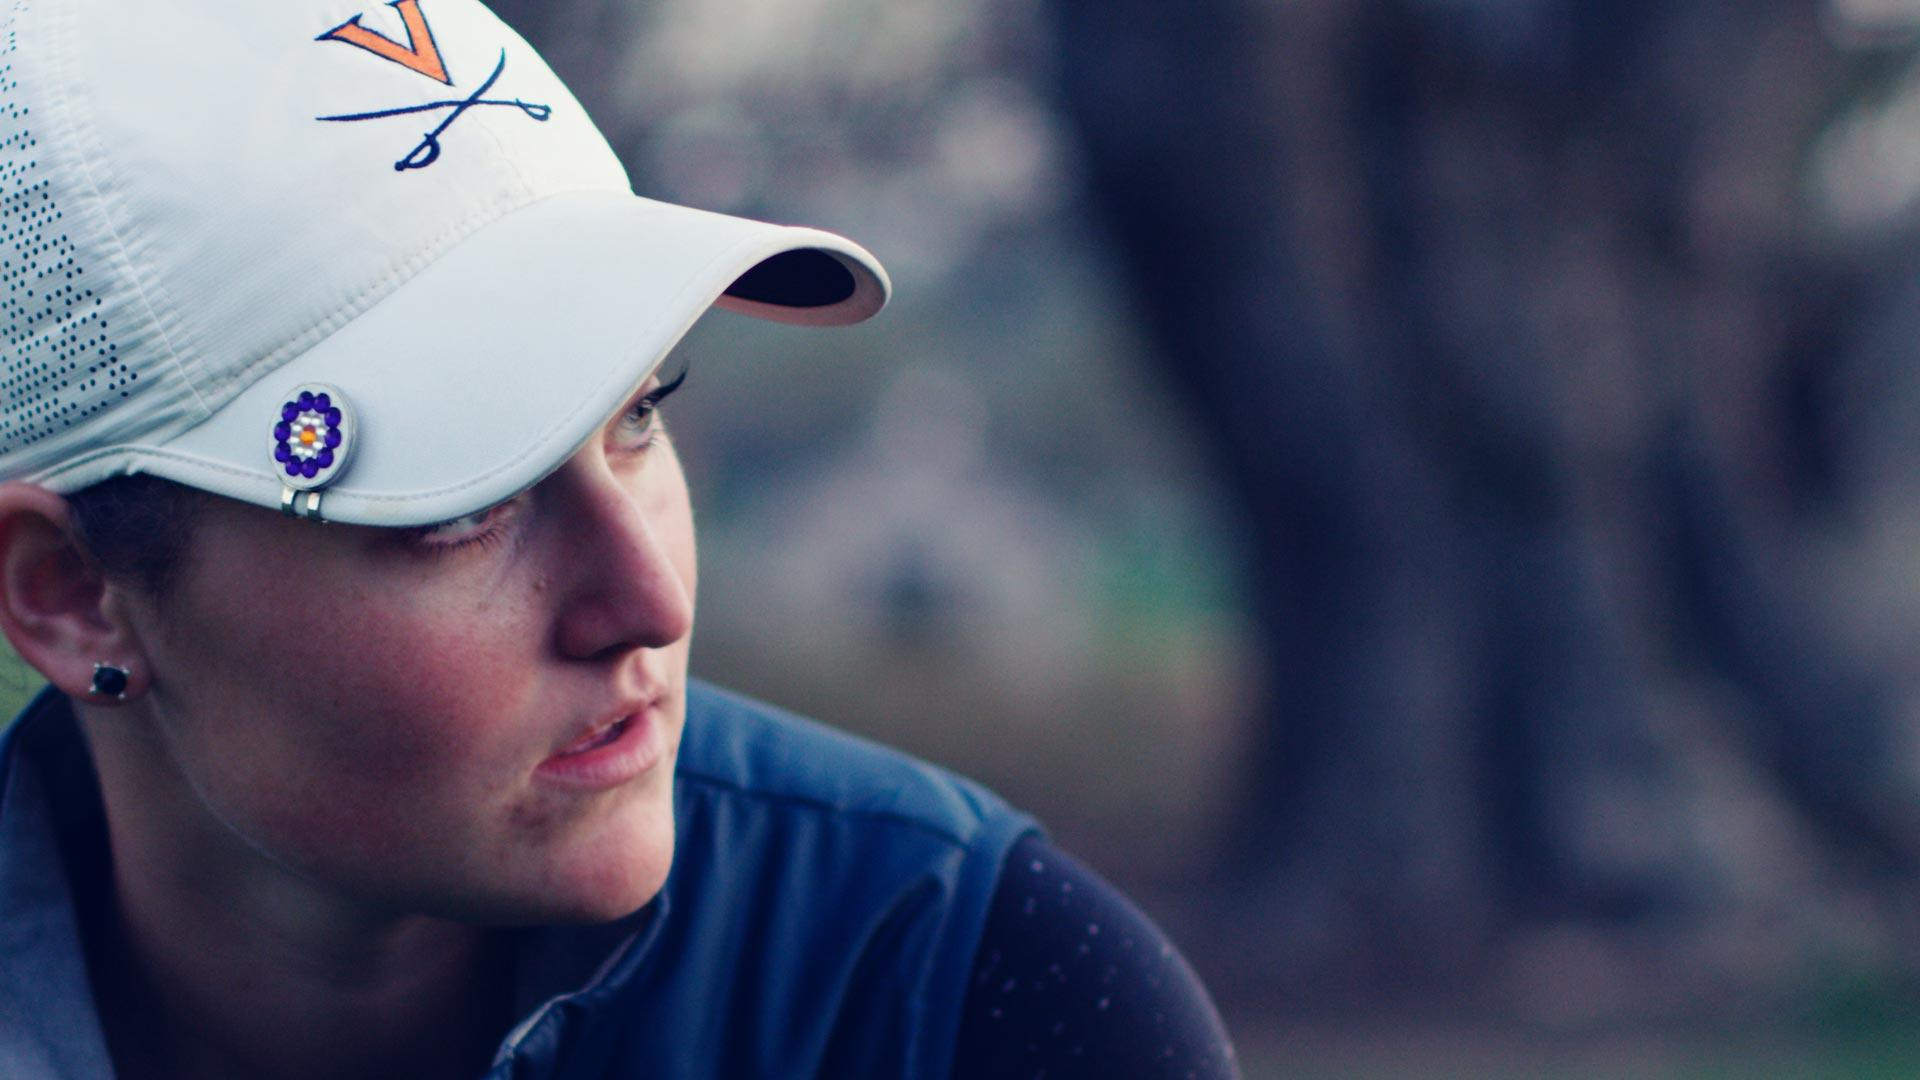 Student Spotlight: Golfer Anna Redding Has a Driving Ambition